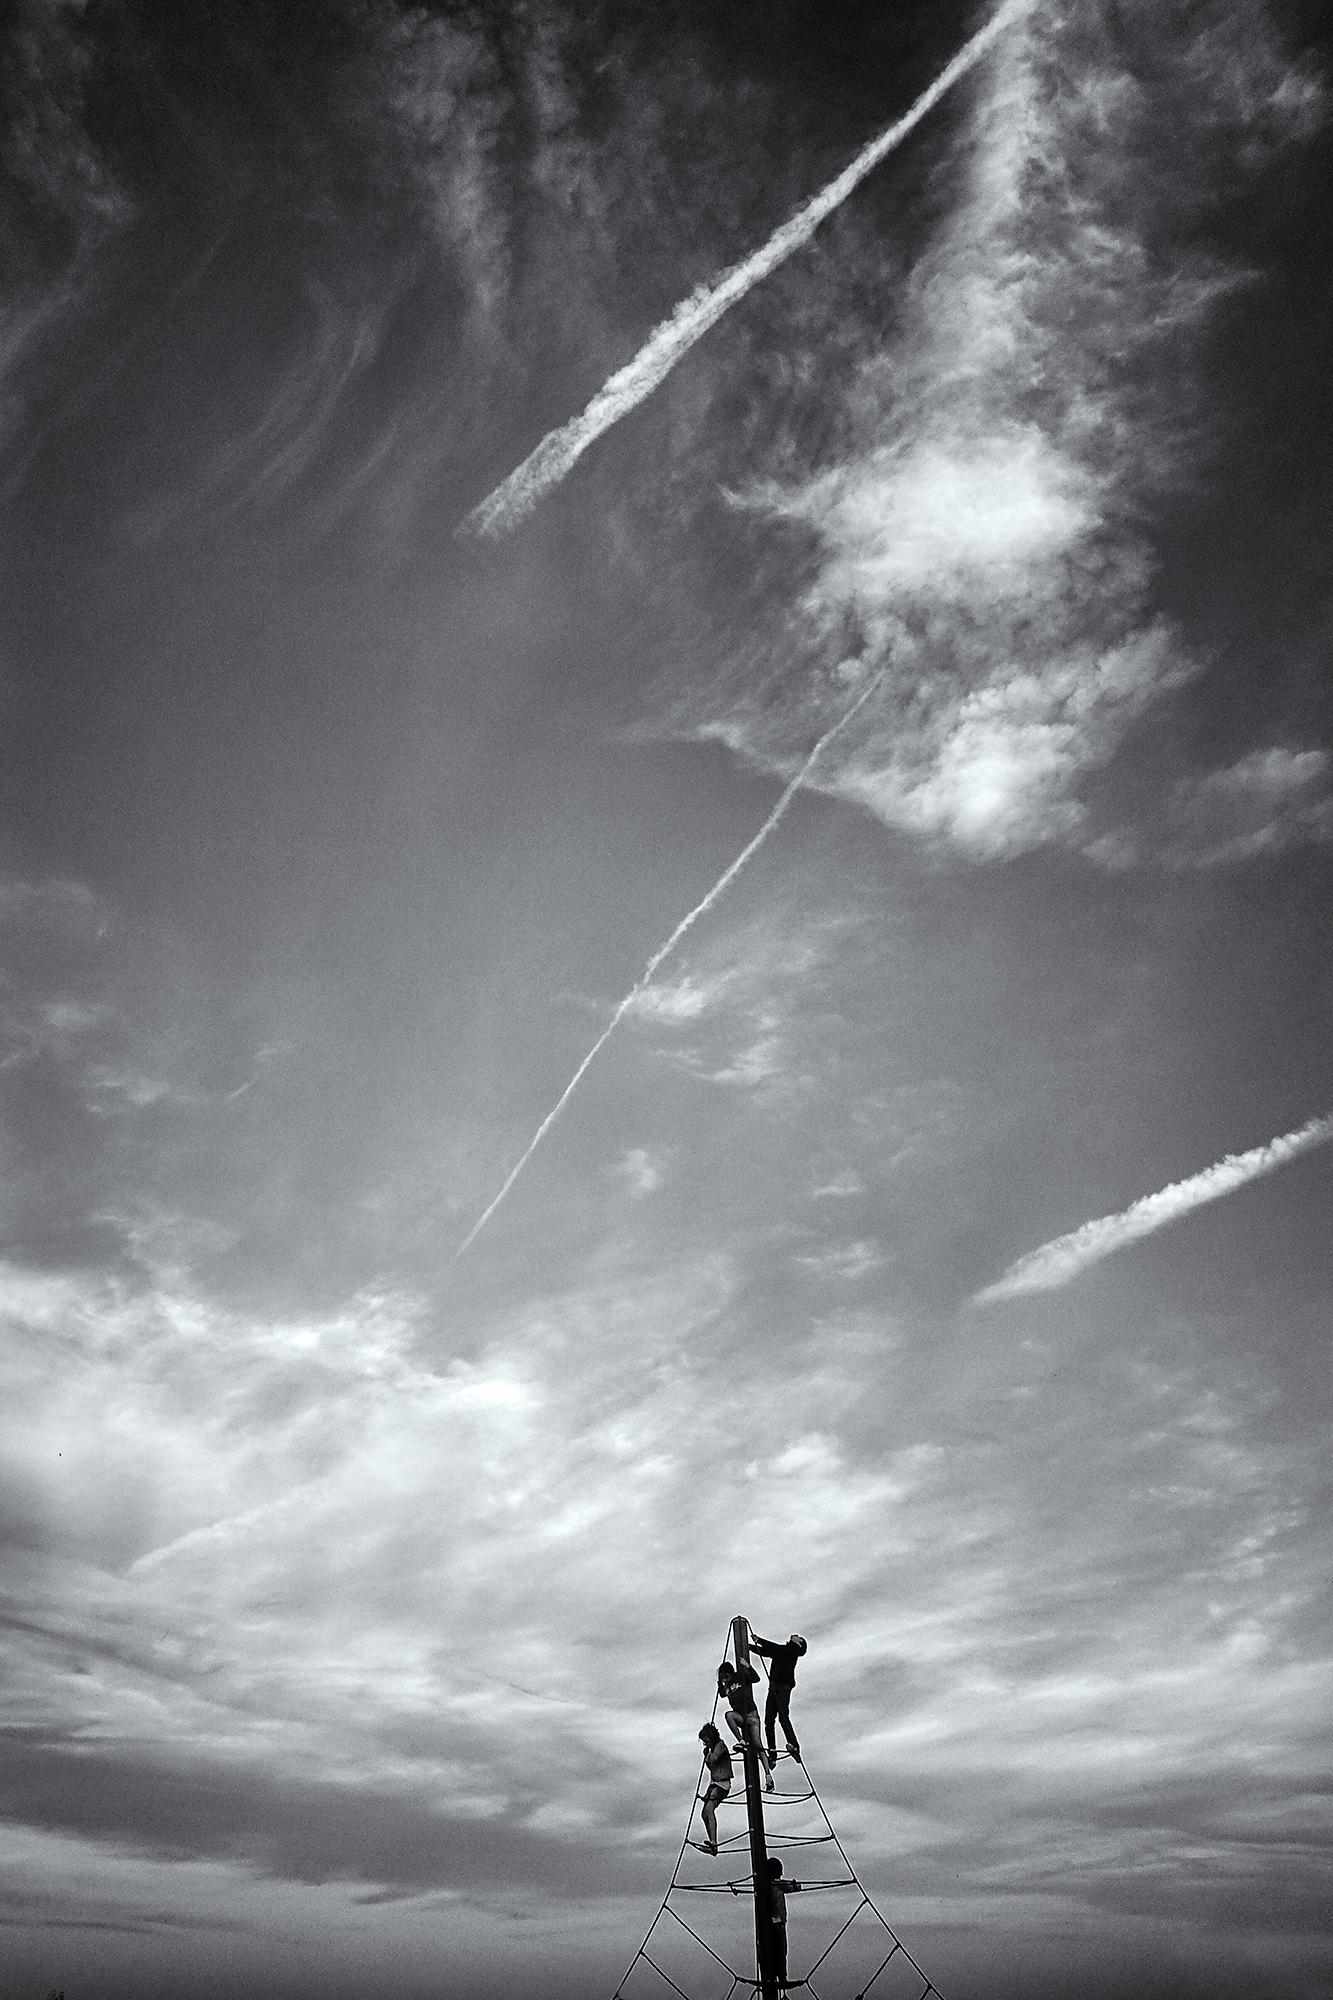 Dreaming of High Flight. Barcelona, 2015